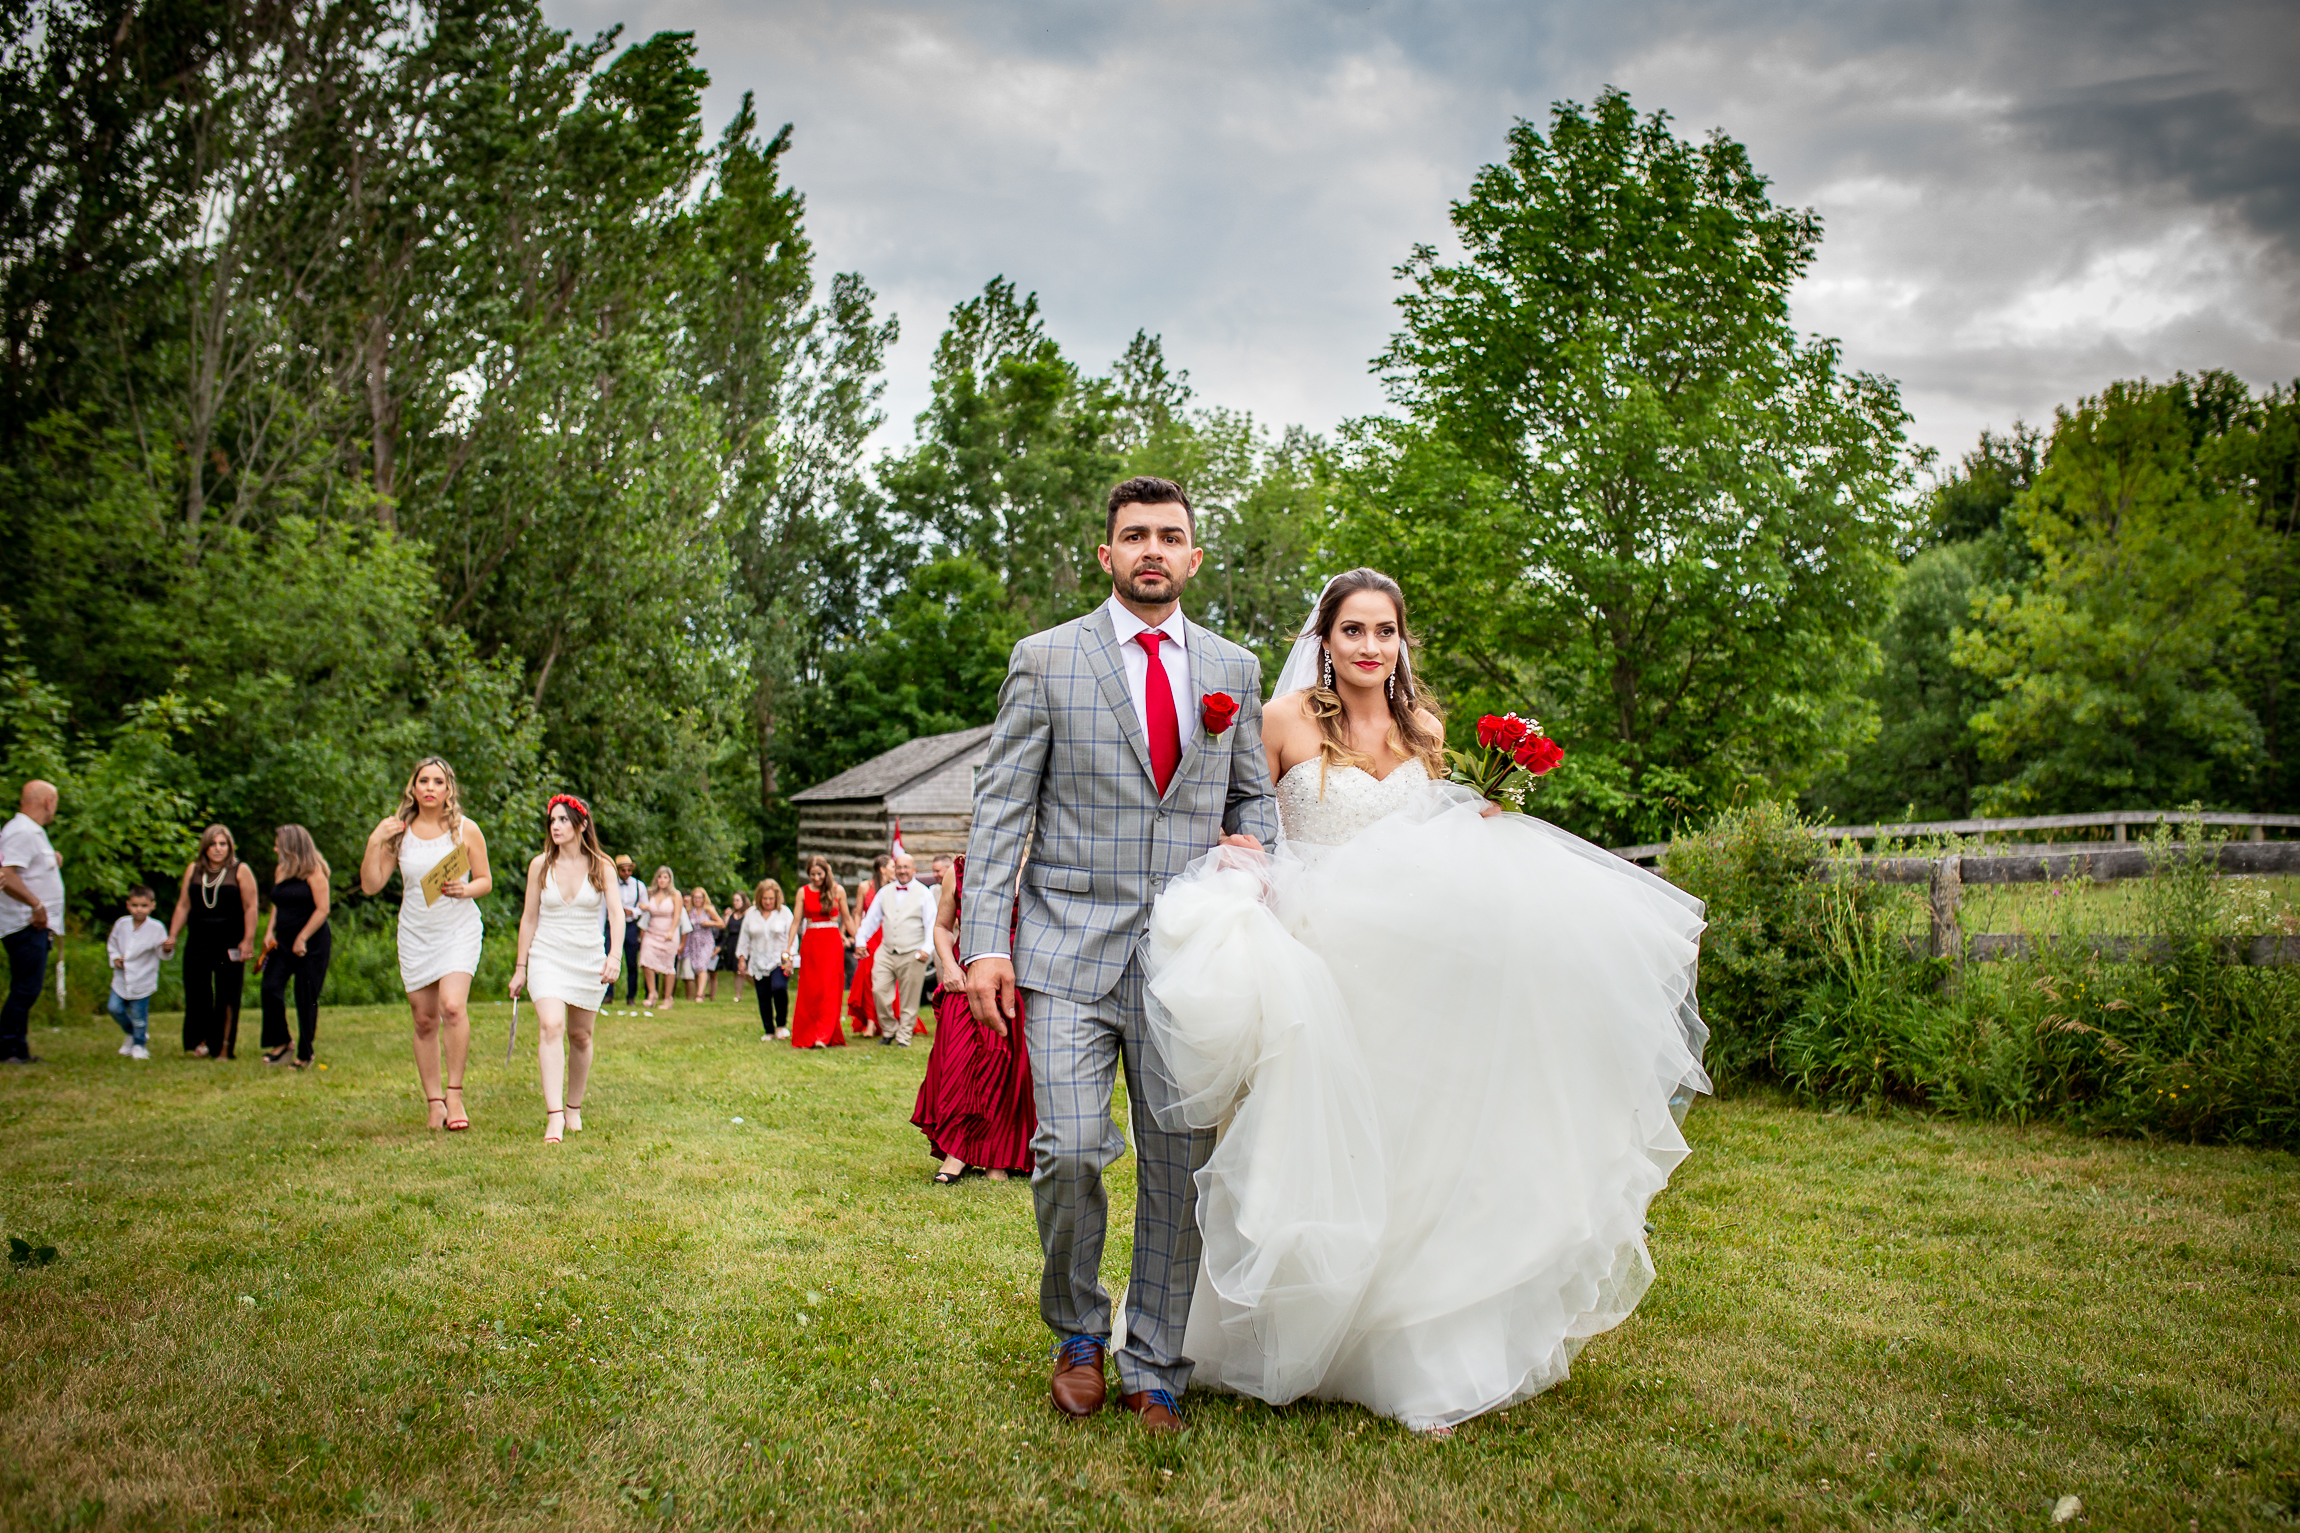 Toronto-wedding-Photograper-99.jpg